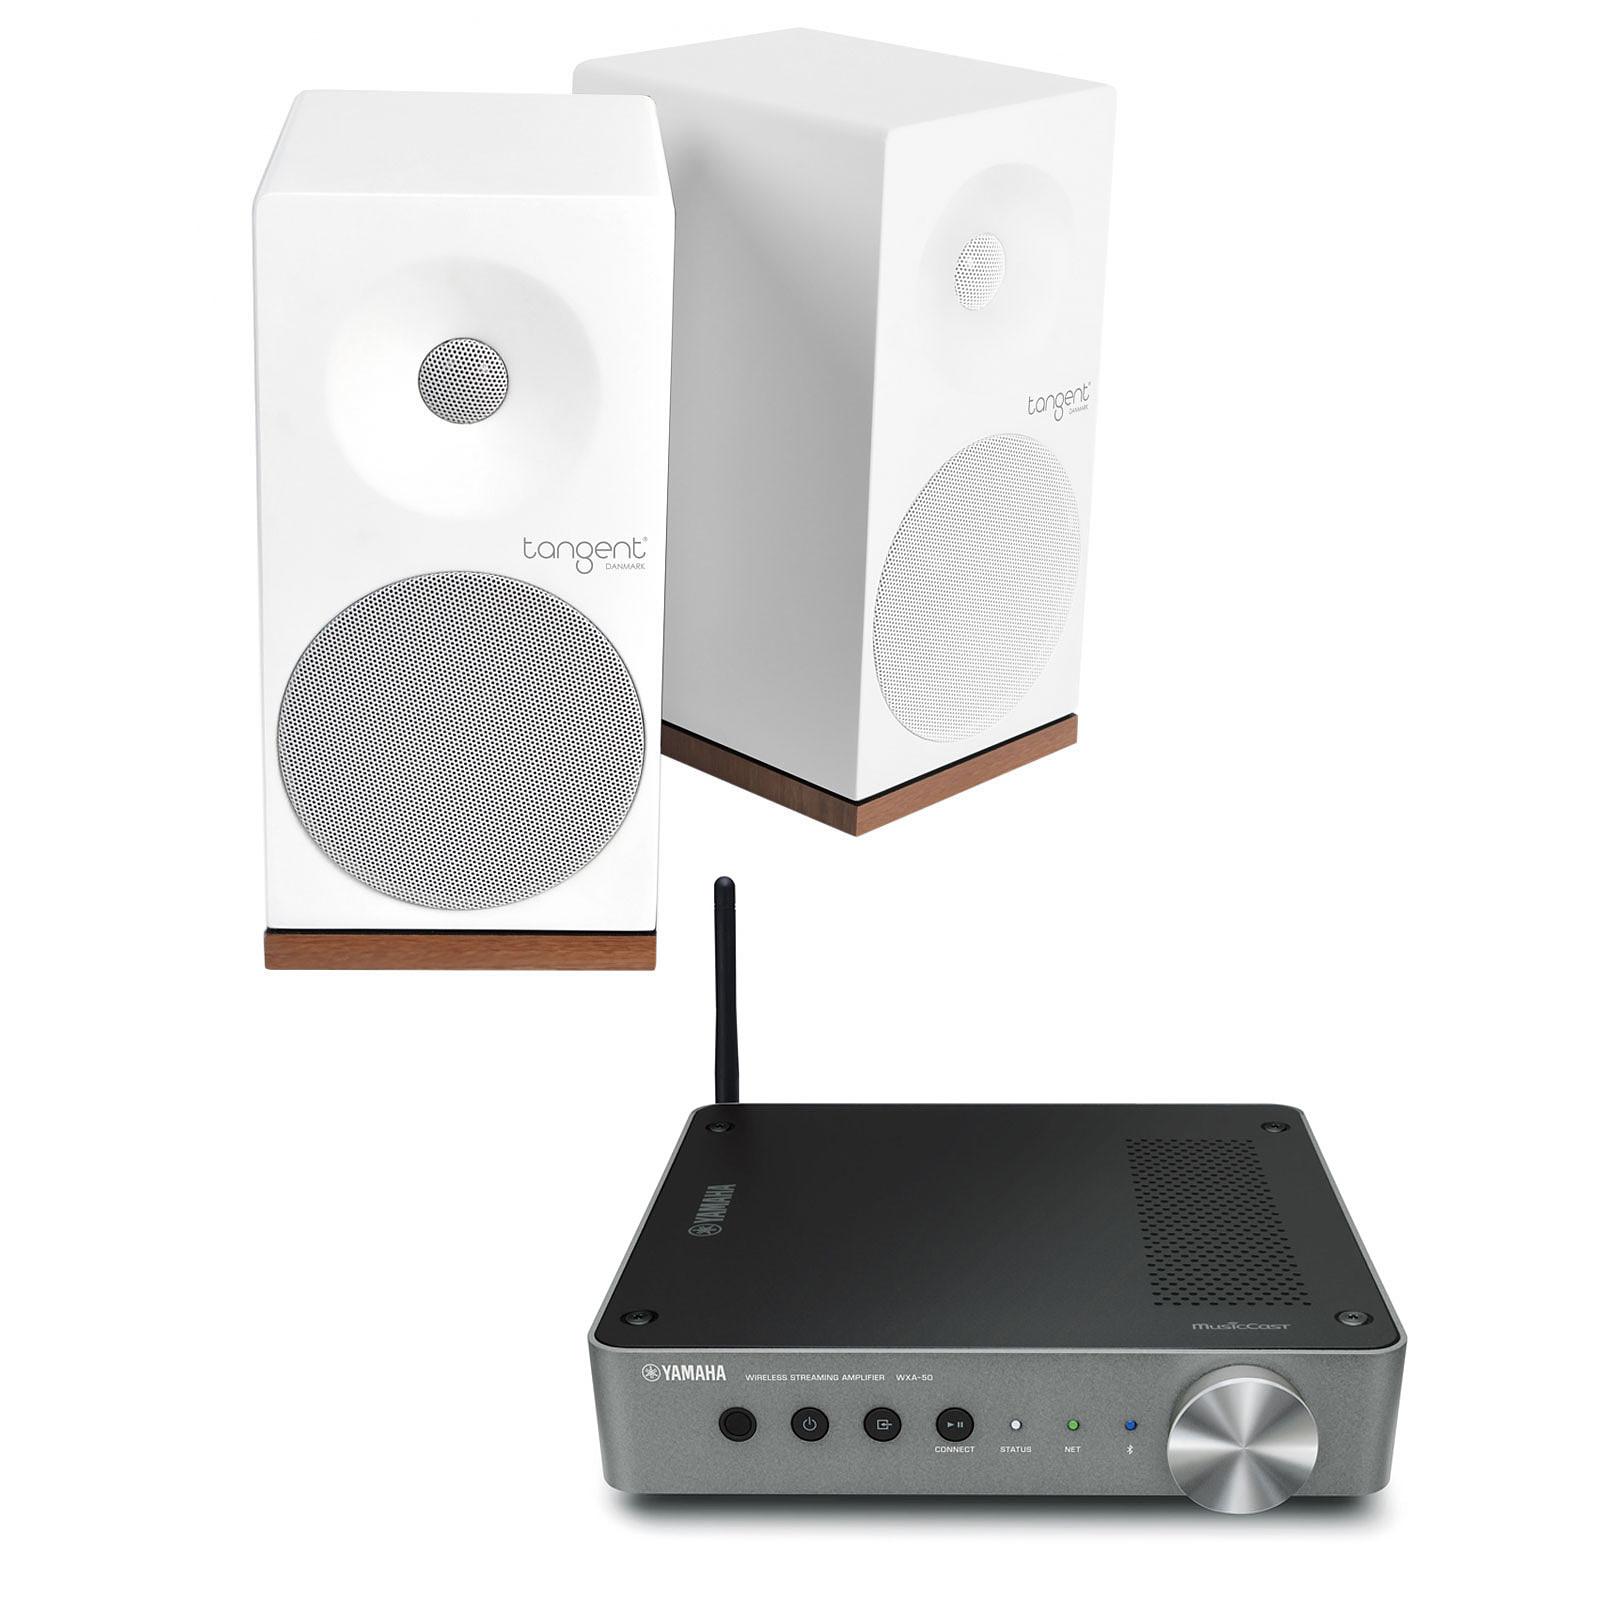 Yamaha MusicCast WXA-50 + Tangent Spectrum X5 Blanc